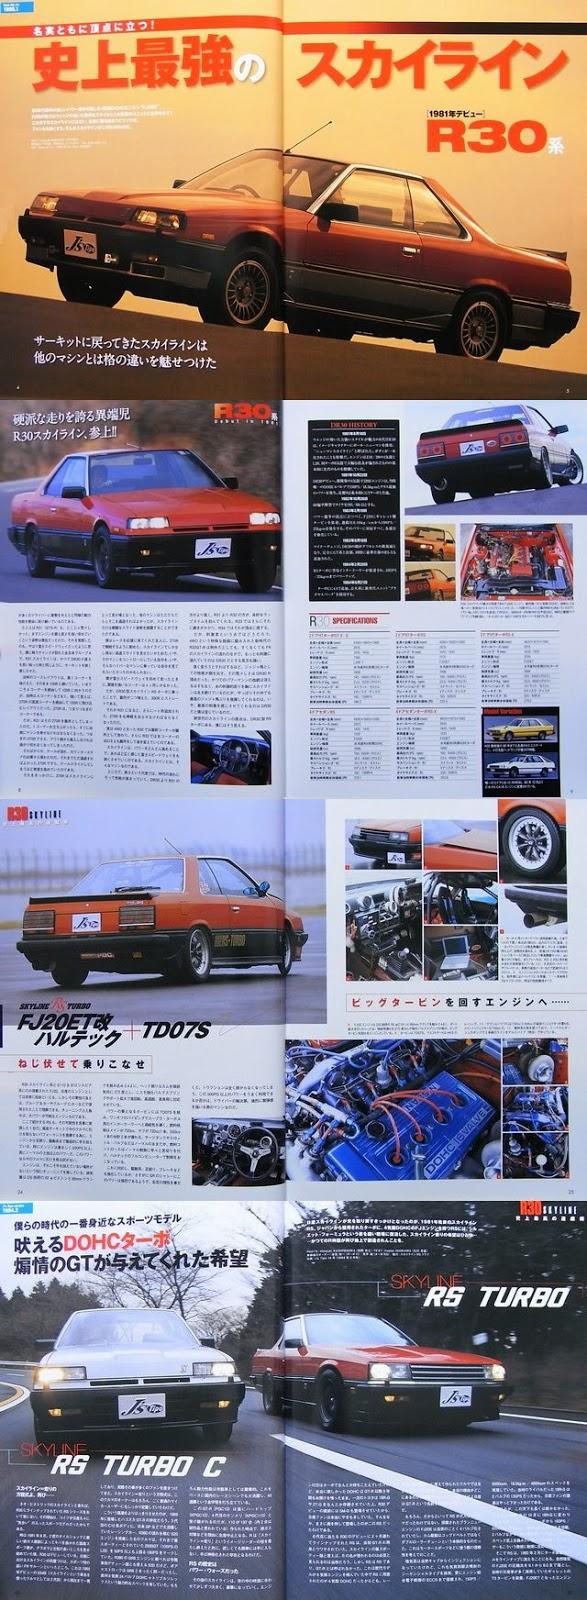 Nissan Skyline, R30, japoński sportowy samochód, lata 80, RWD, coupe, RS, FJ20E 日本車 日産 スカイライン